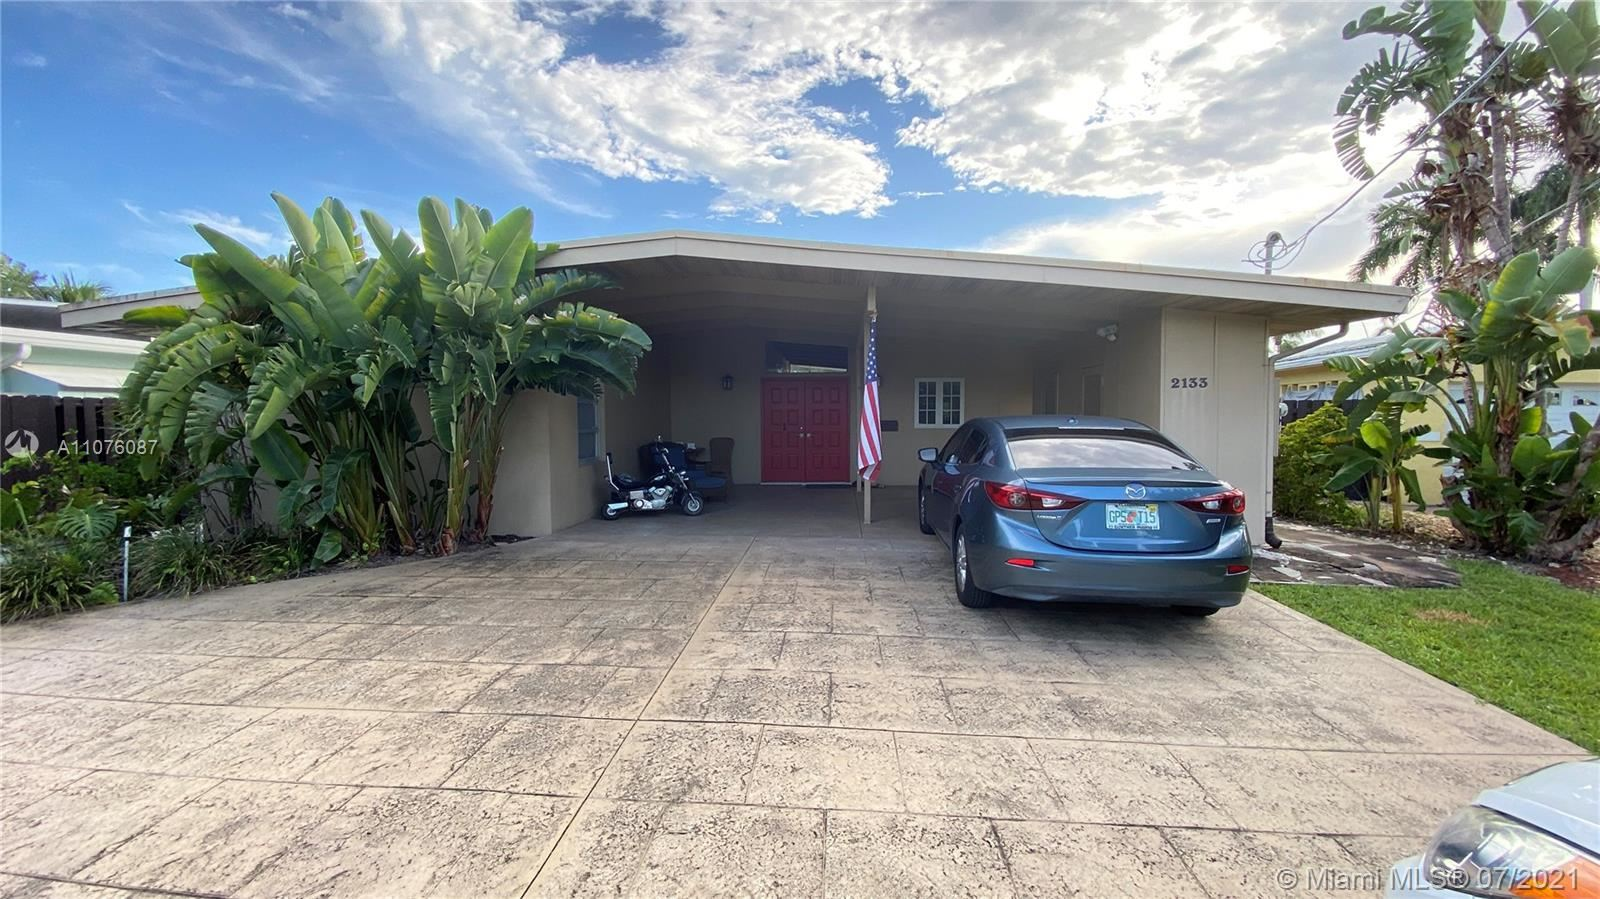 Photo of 2133 NE 20th Ave, Wilton Manors, FL 33305 (MLS # A11076087)